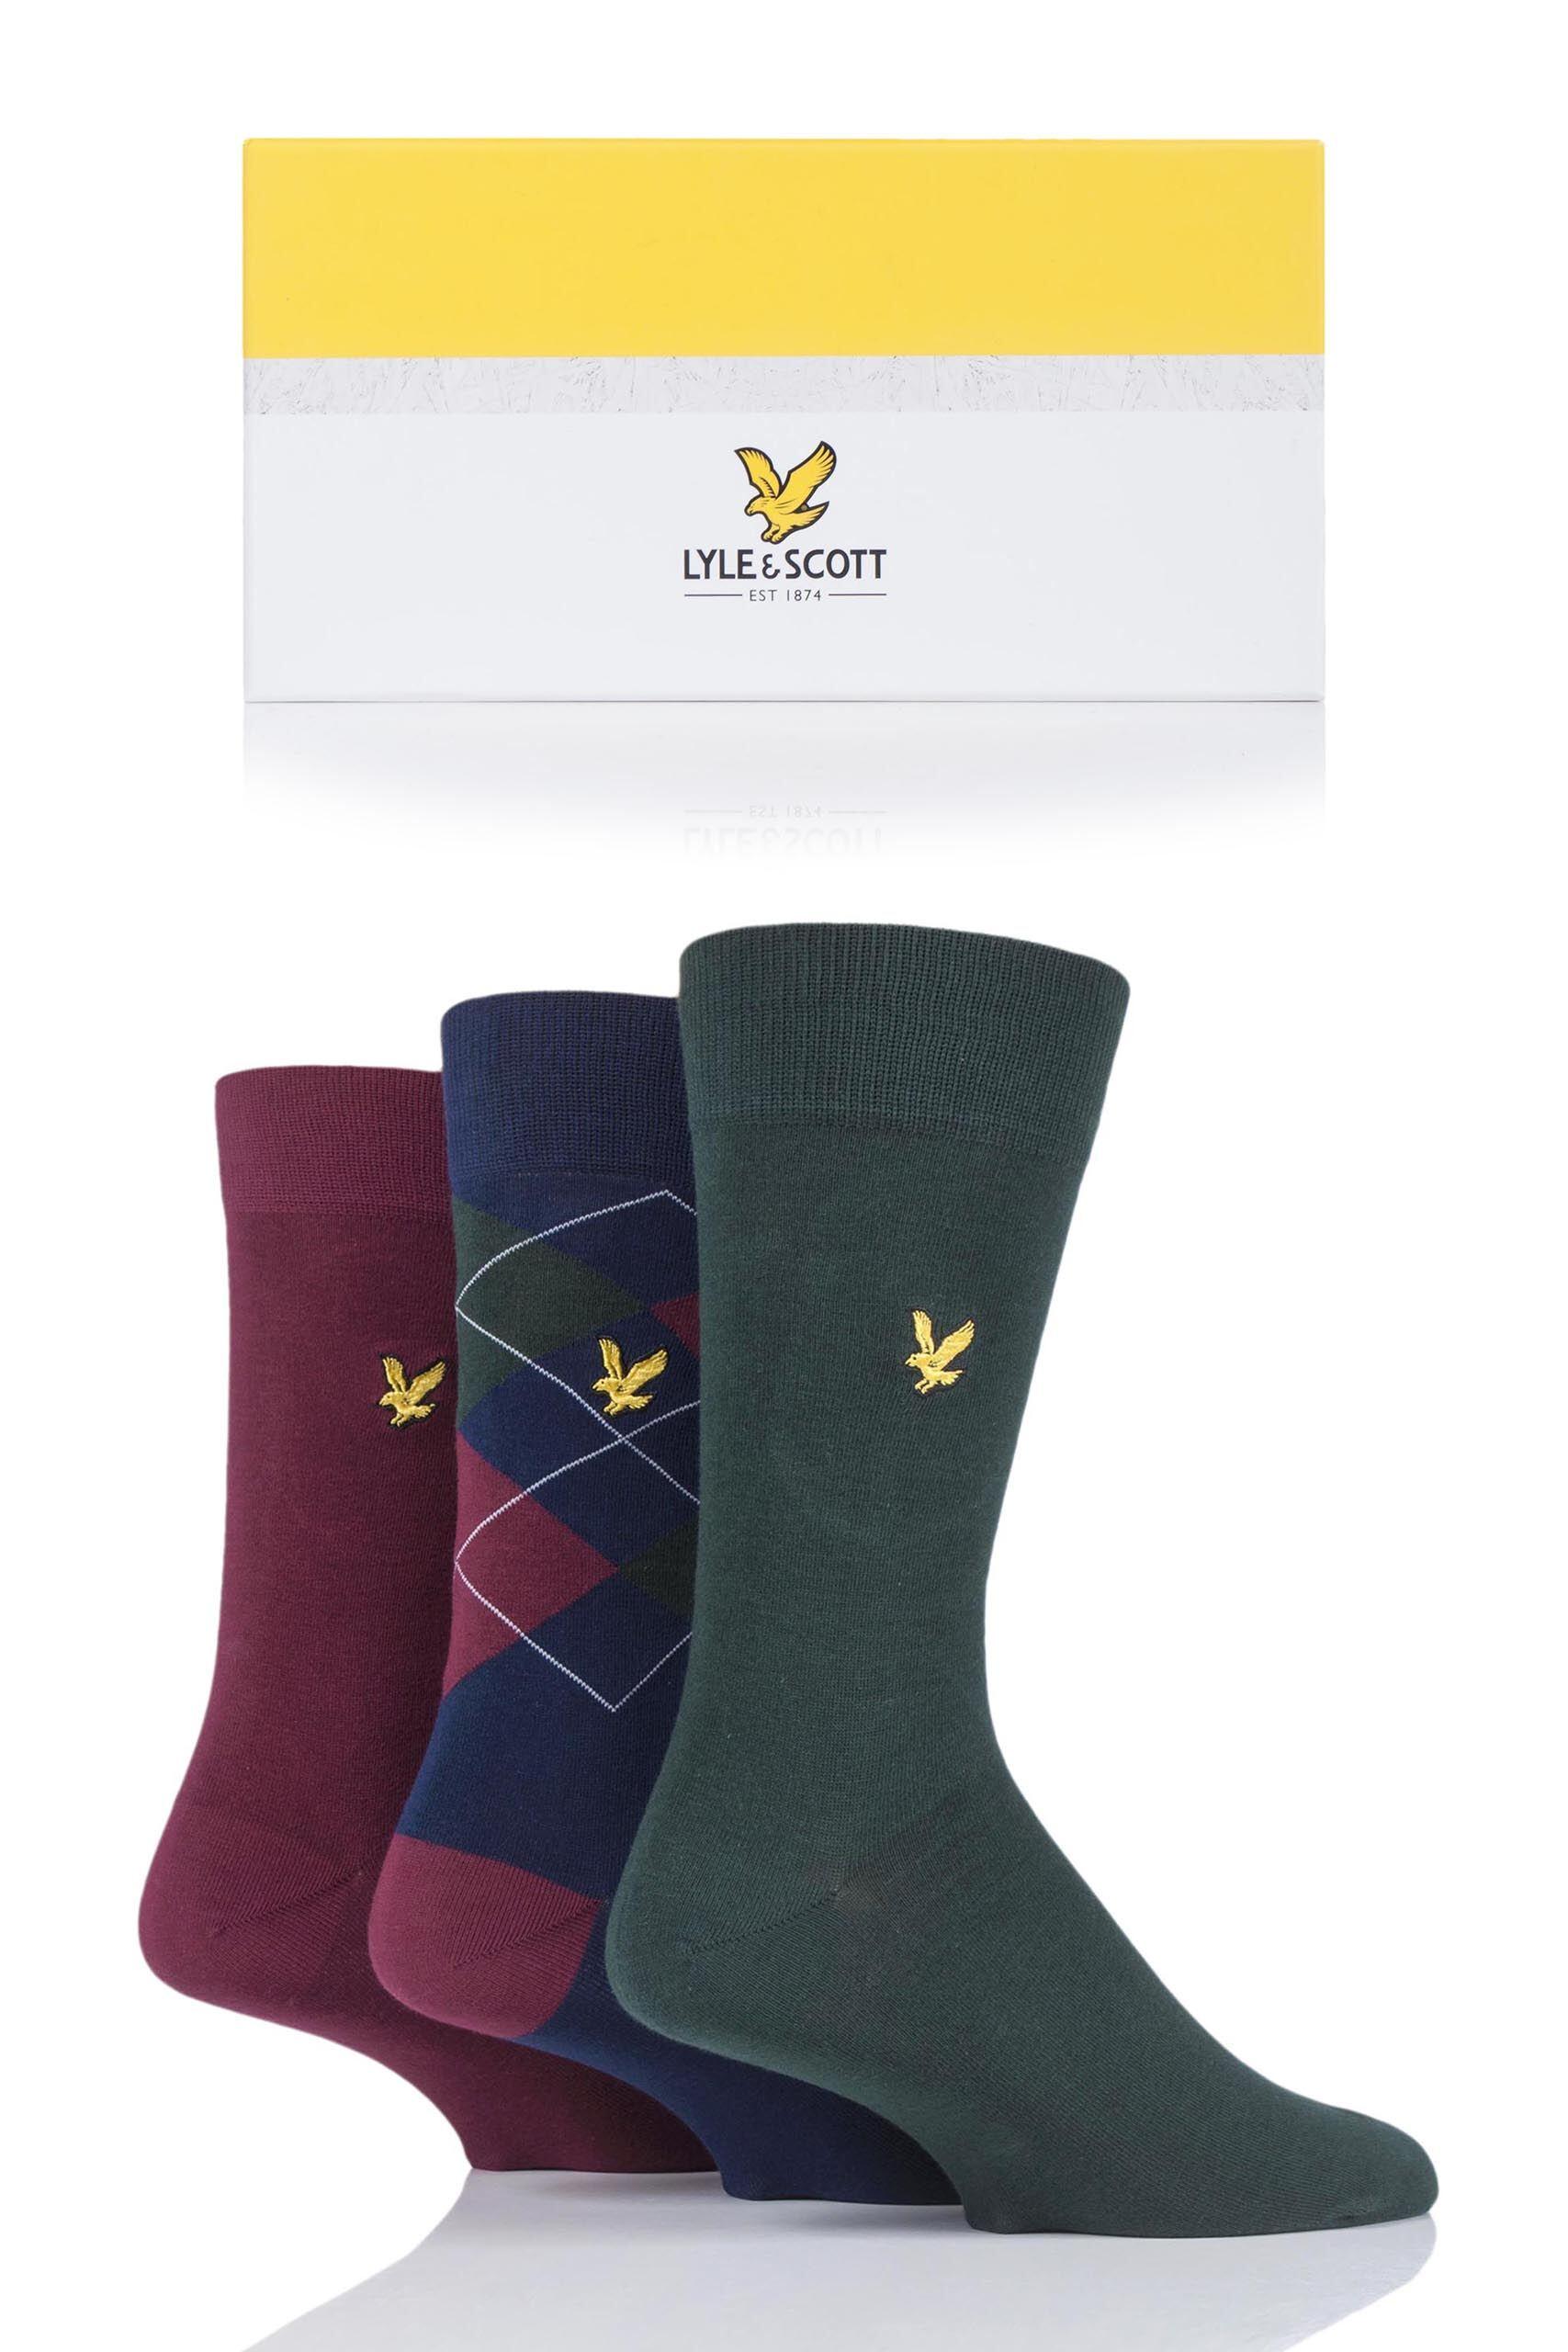 Image of 3 Pair Rory Rory Gift Boxed Cotton Socks Men's 7-11 Mens - Lyle & Scott